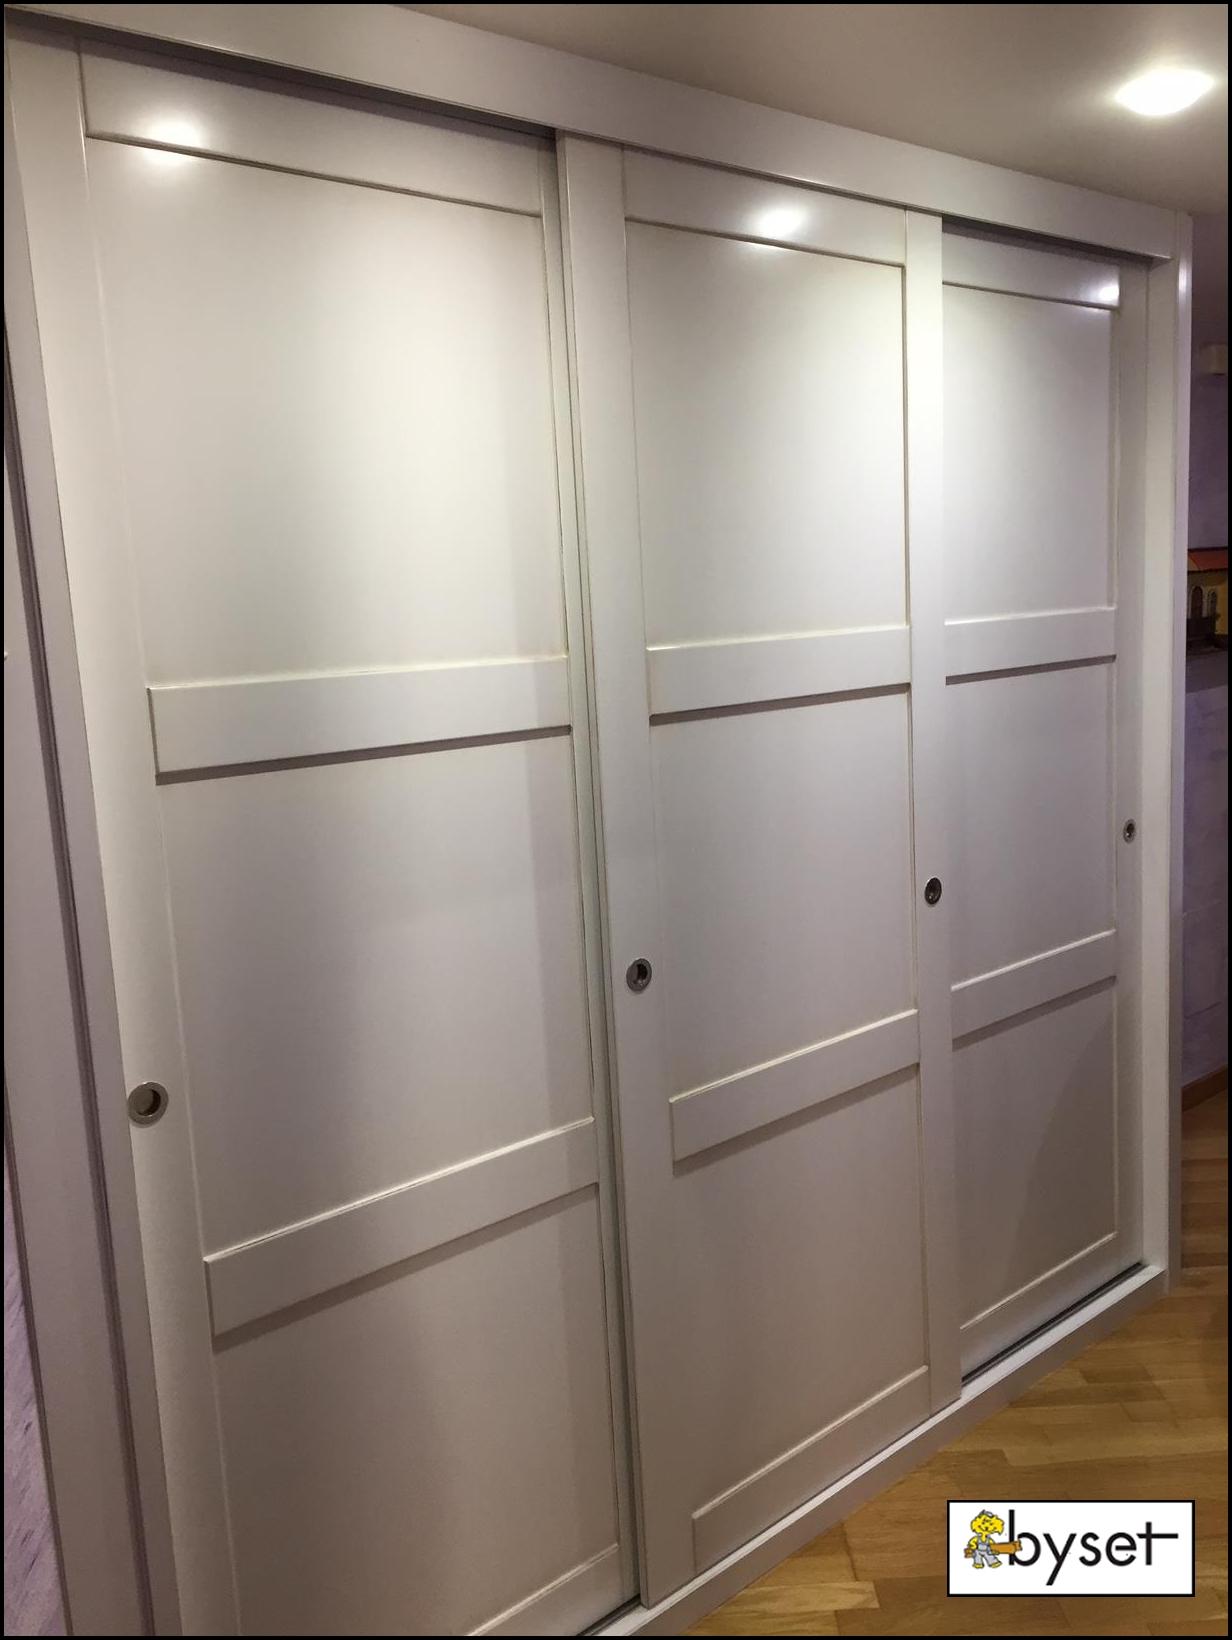 Armario empotrado entrada mueblesbyset for Armario de pared con entrada equipada